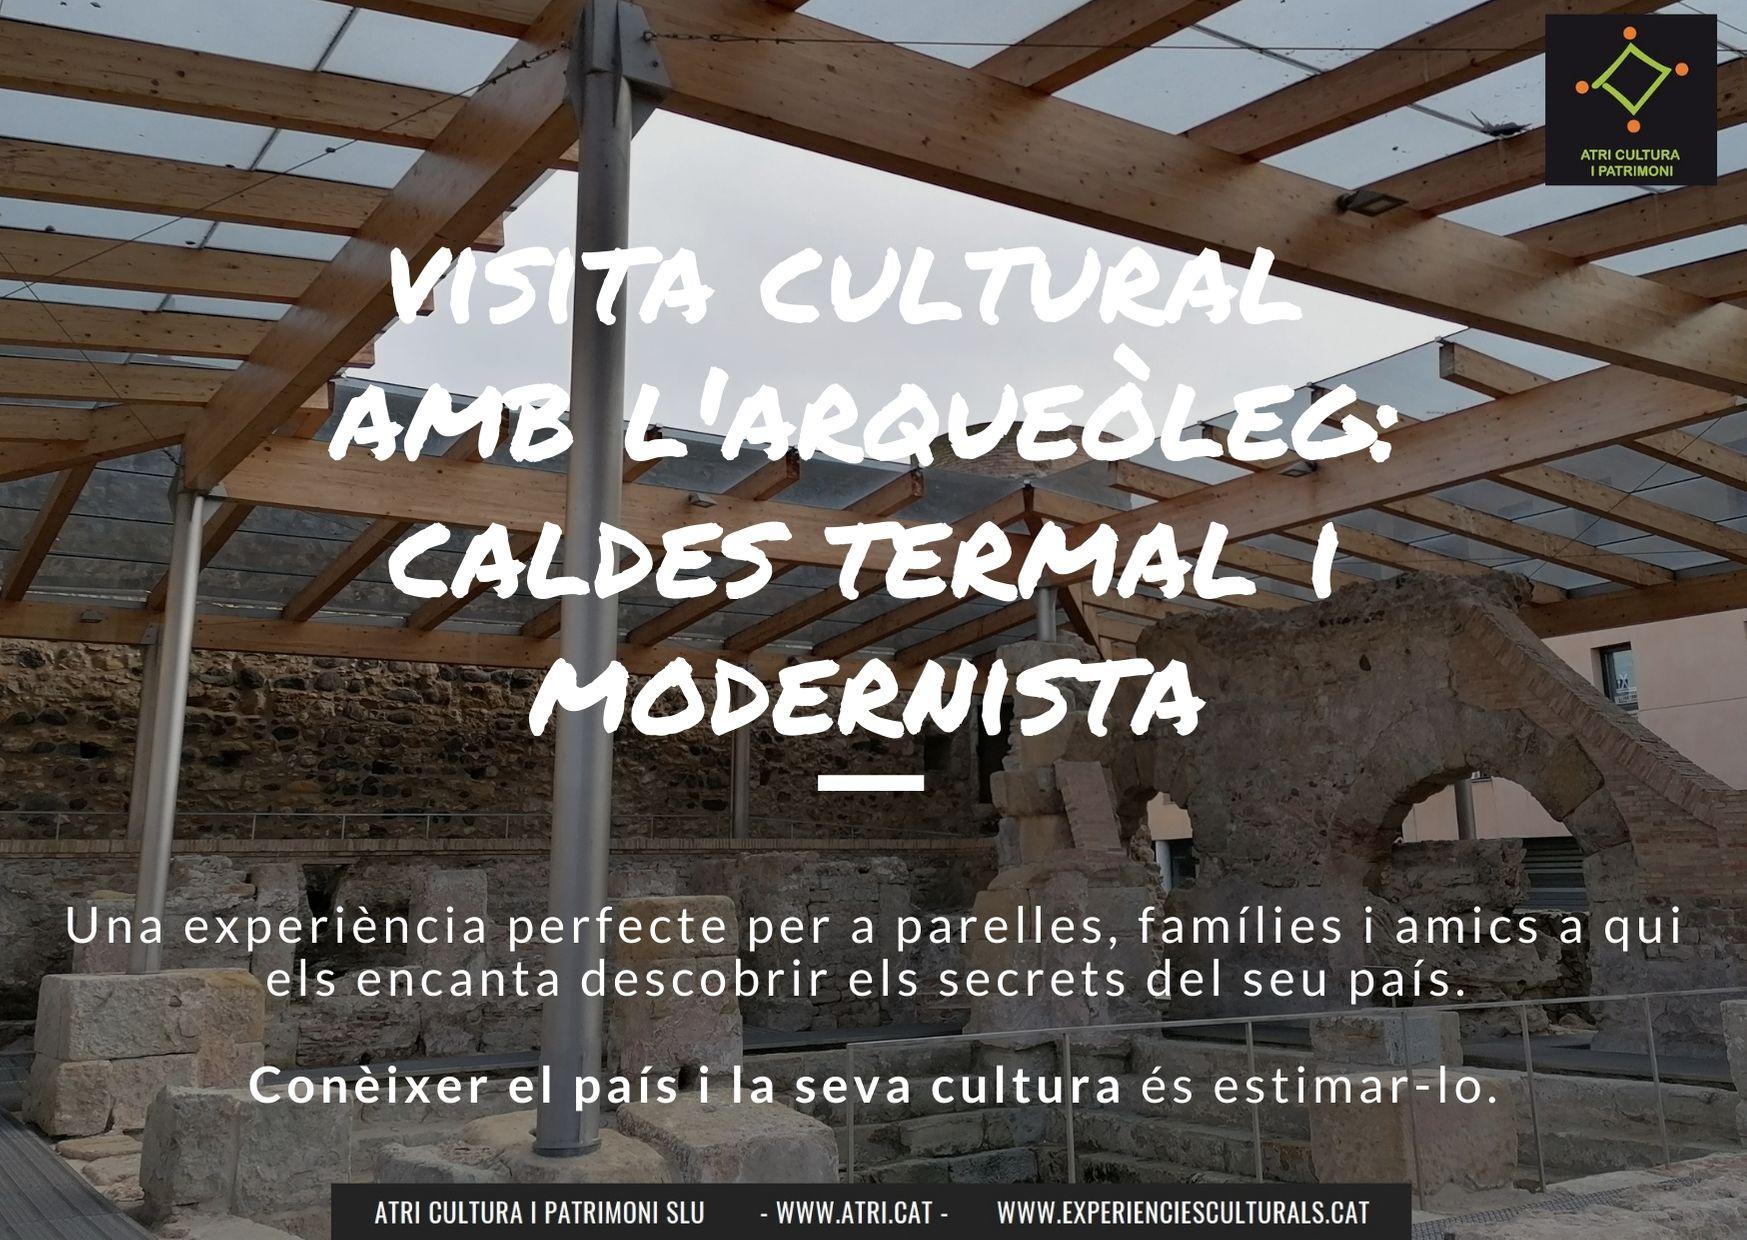 Visita arqueòleg Termes romanes Caldes Malavella